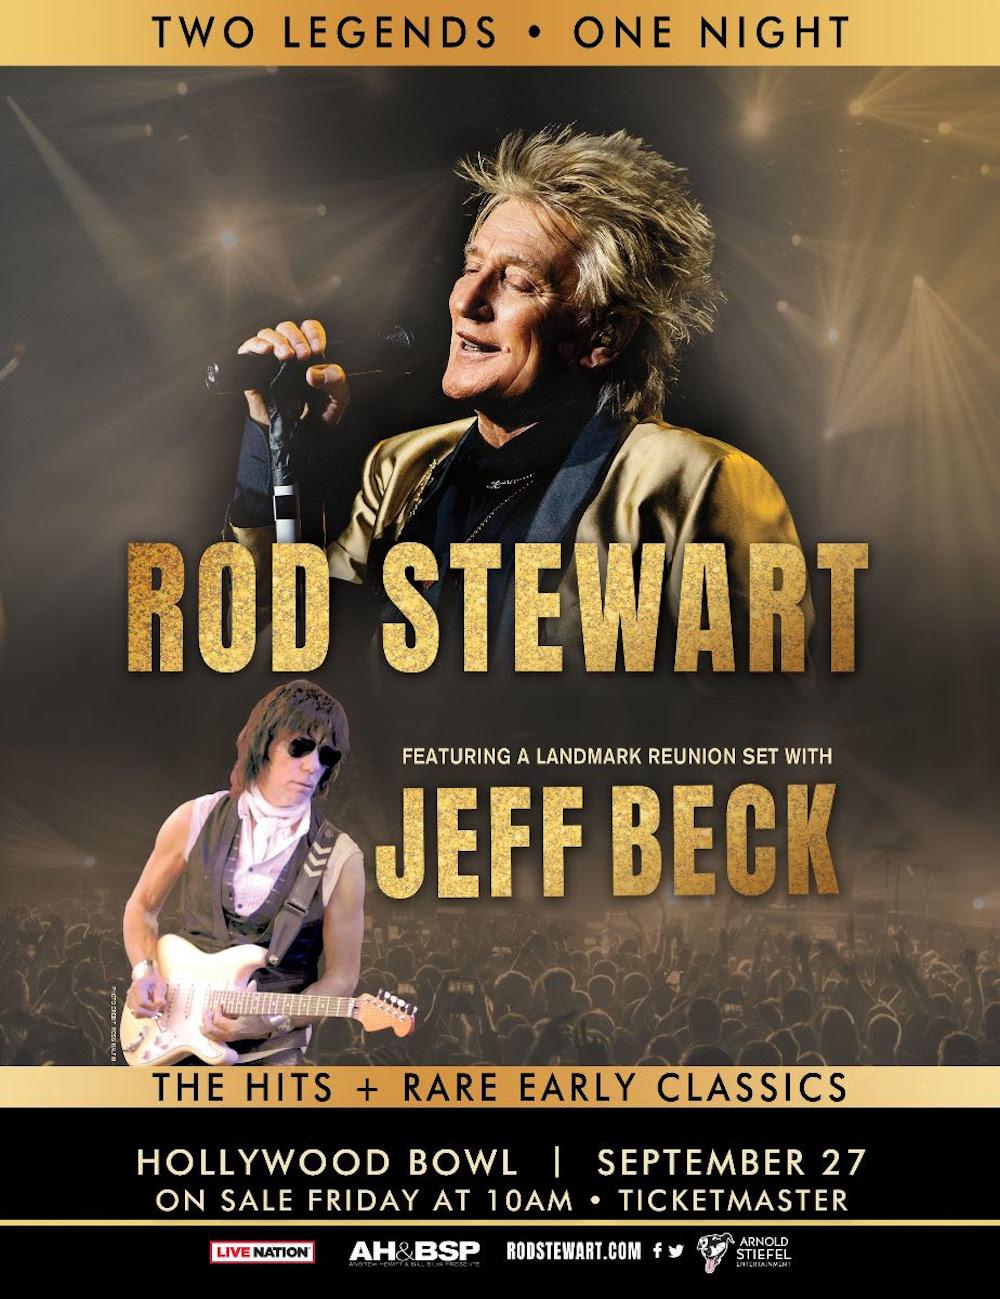 jeff beck group rod stewart reunion hollywood bowl